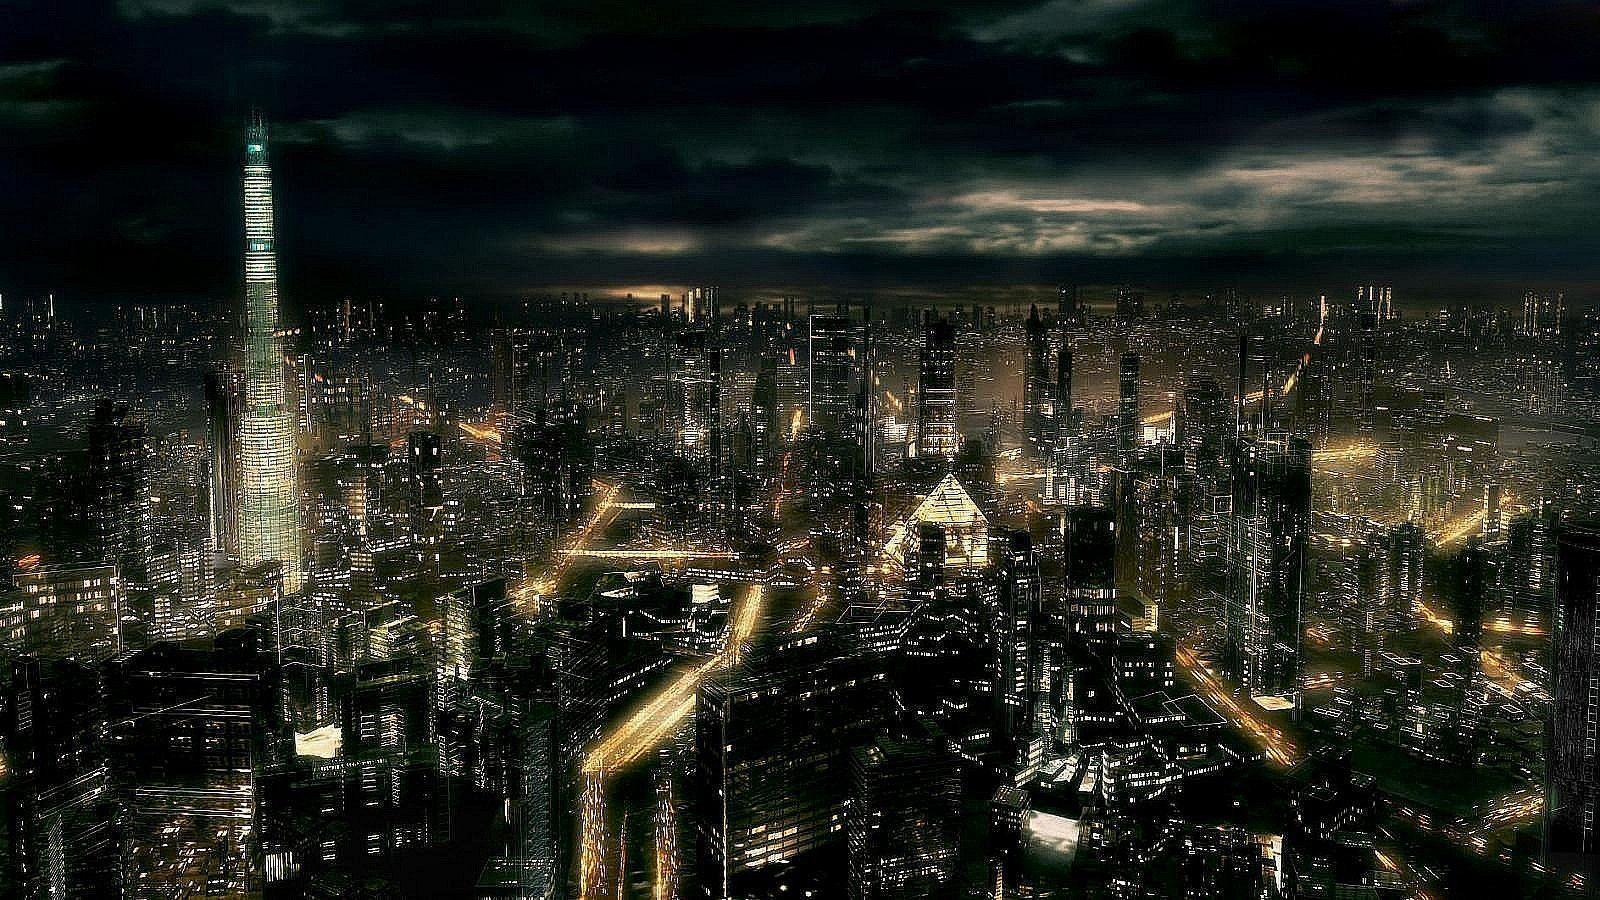 Dark City Wallpapers - Wallpaper Cave